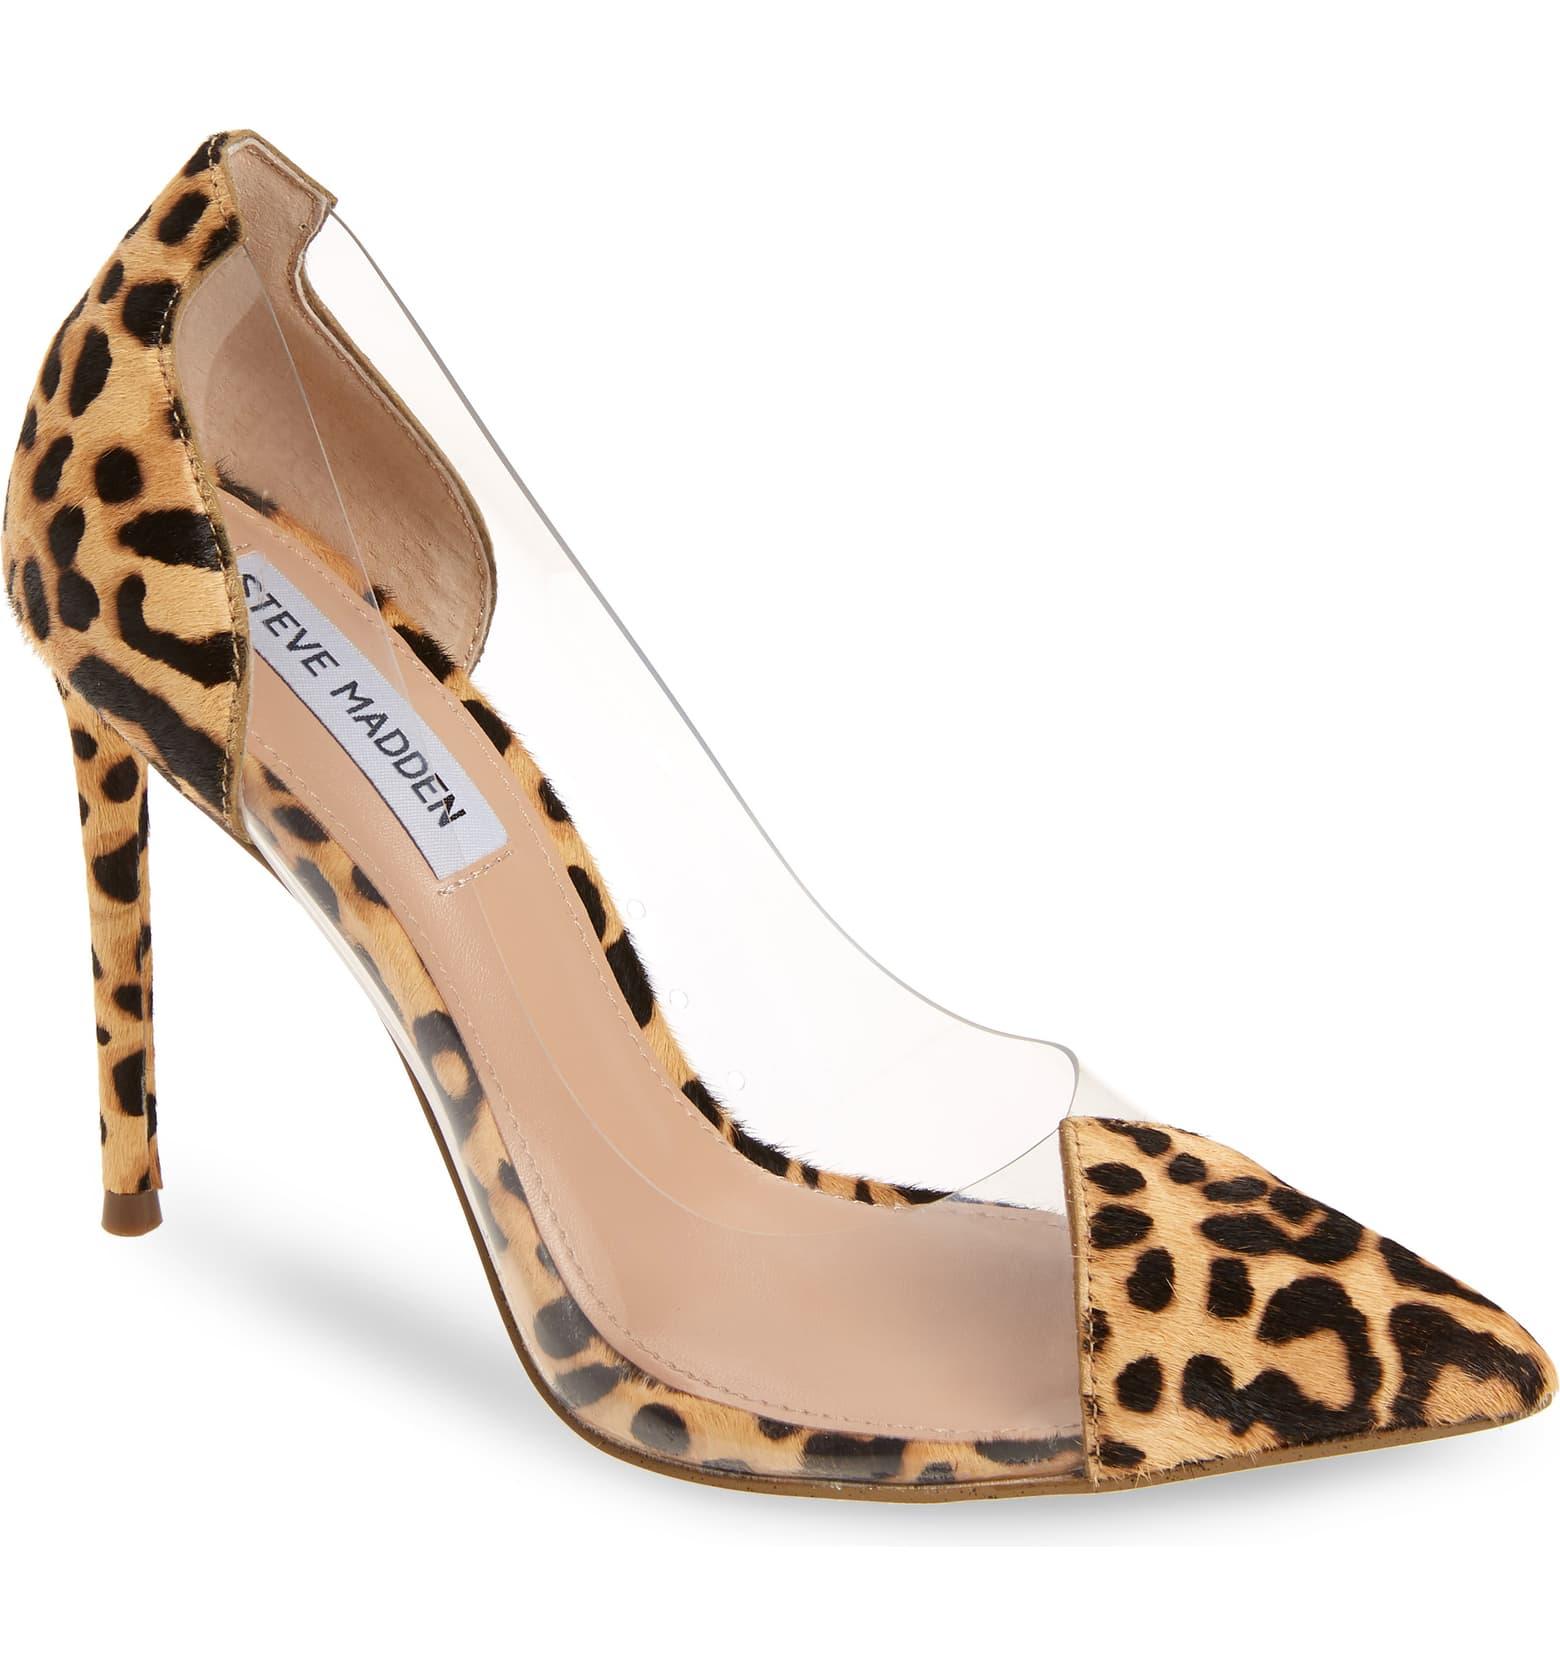 leopard clear pumps.jpg